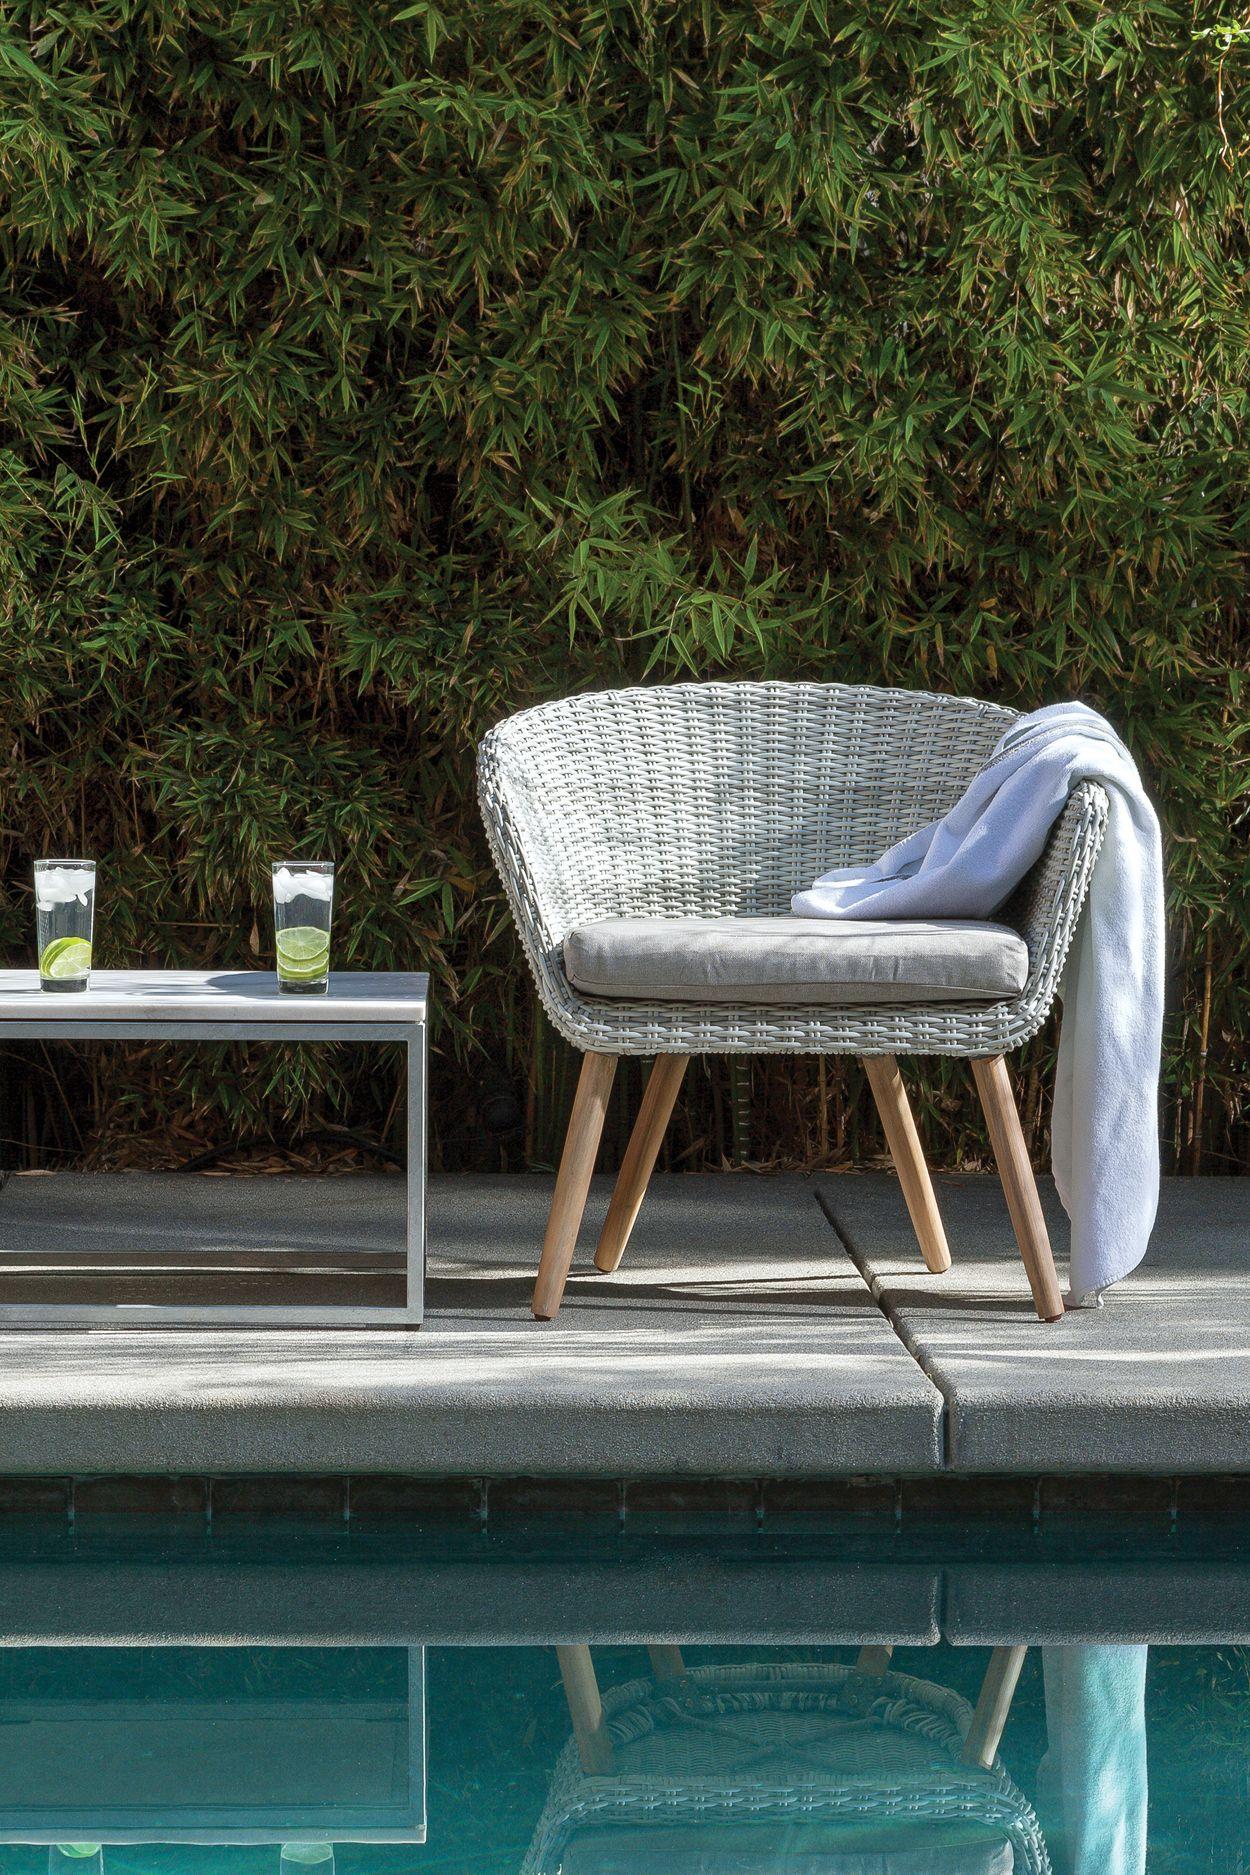 Ora Beach Sand Basket Chair Chair Outdoor Chairs Small House